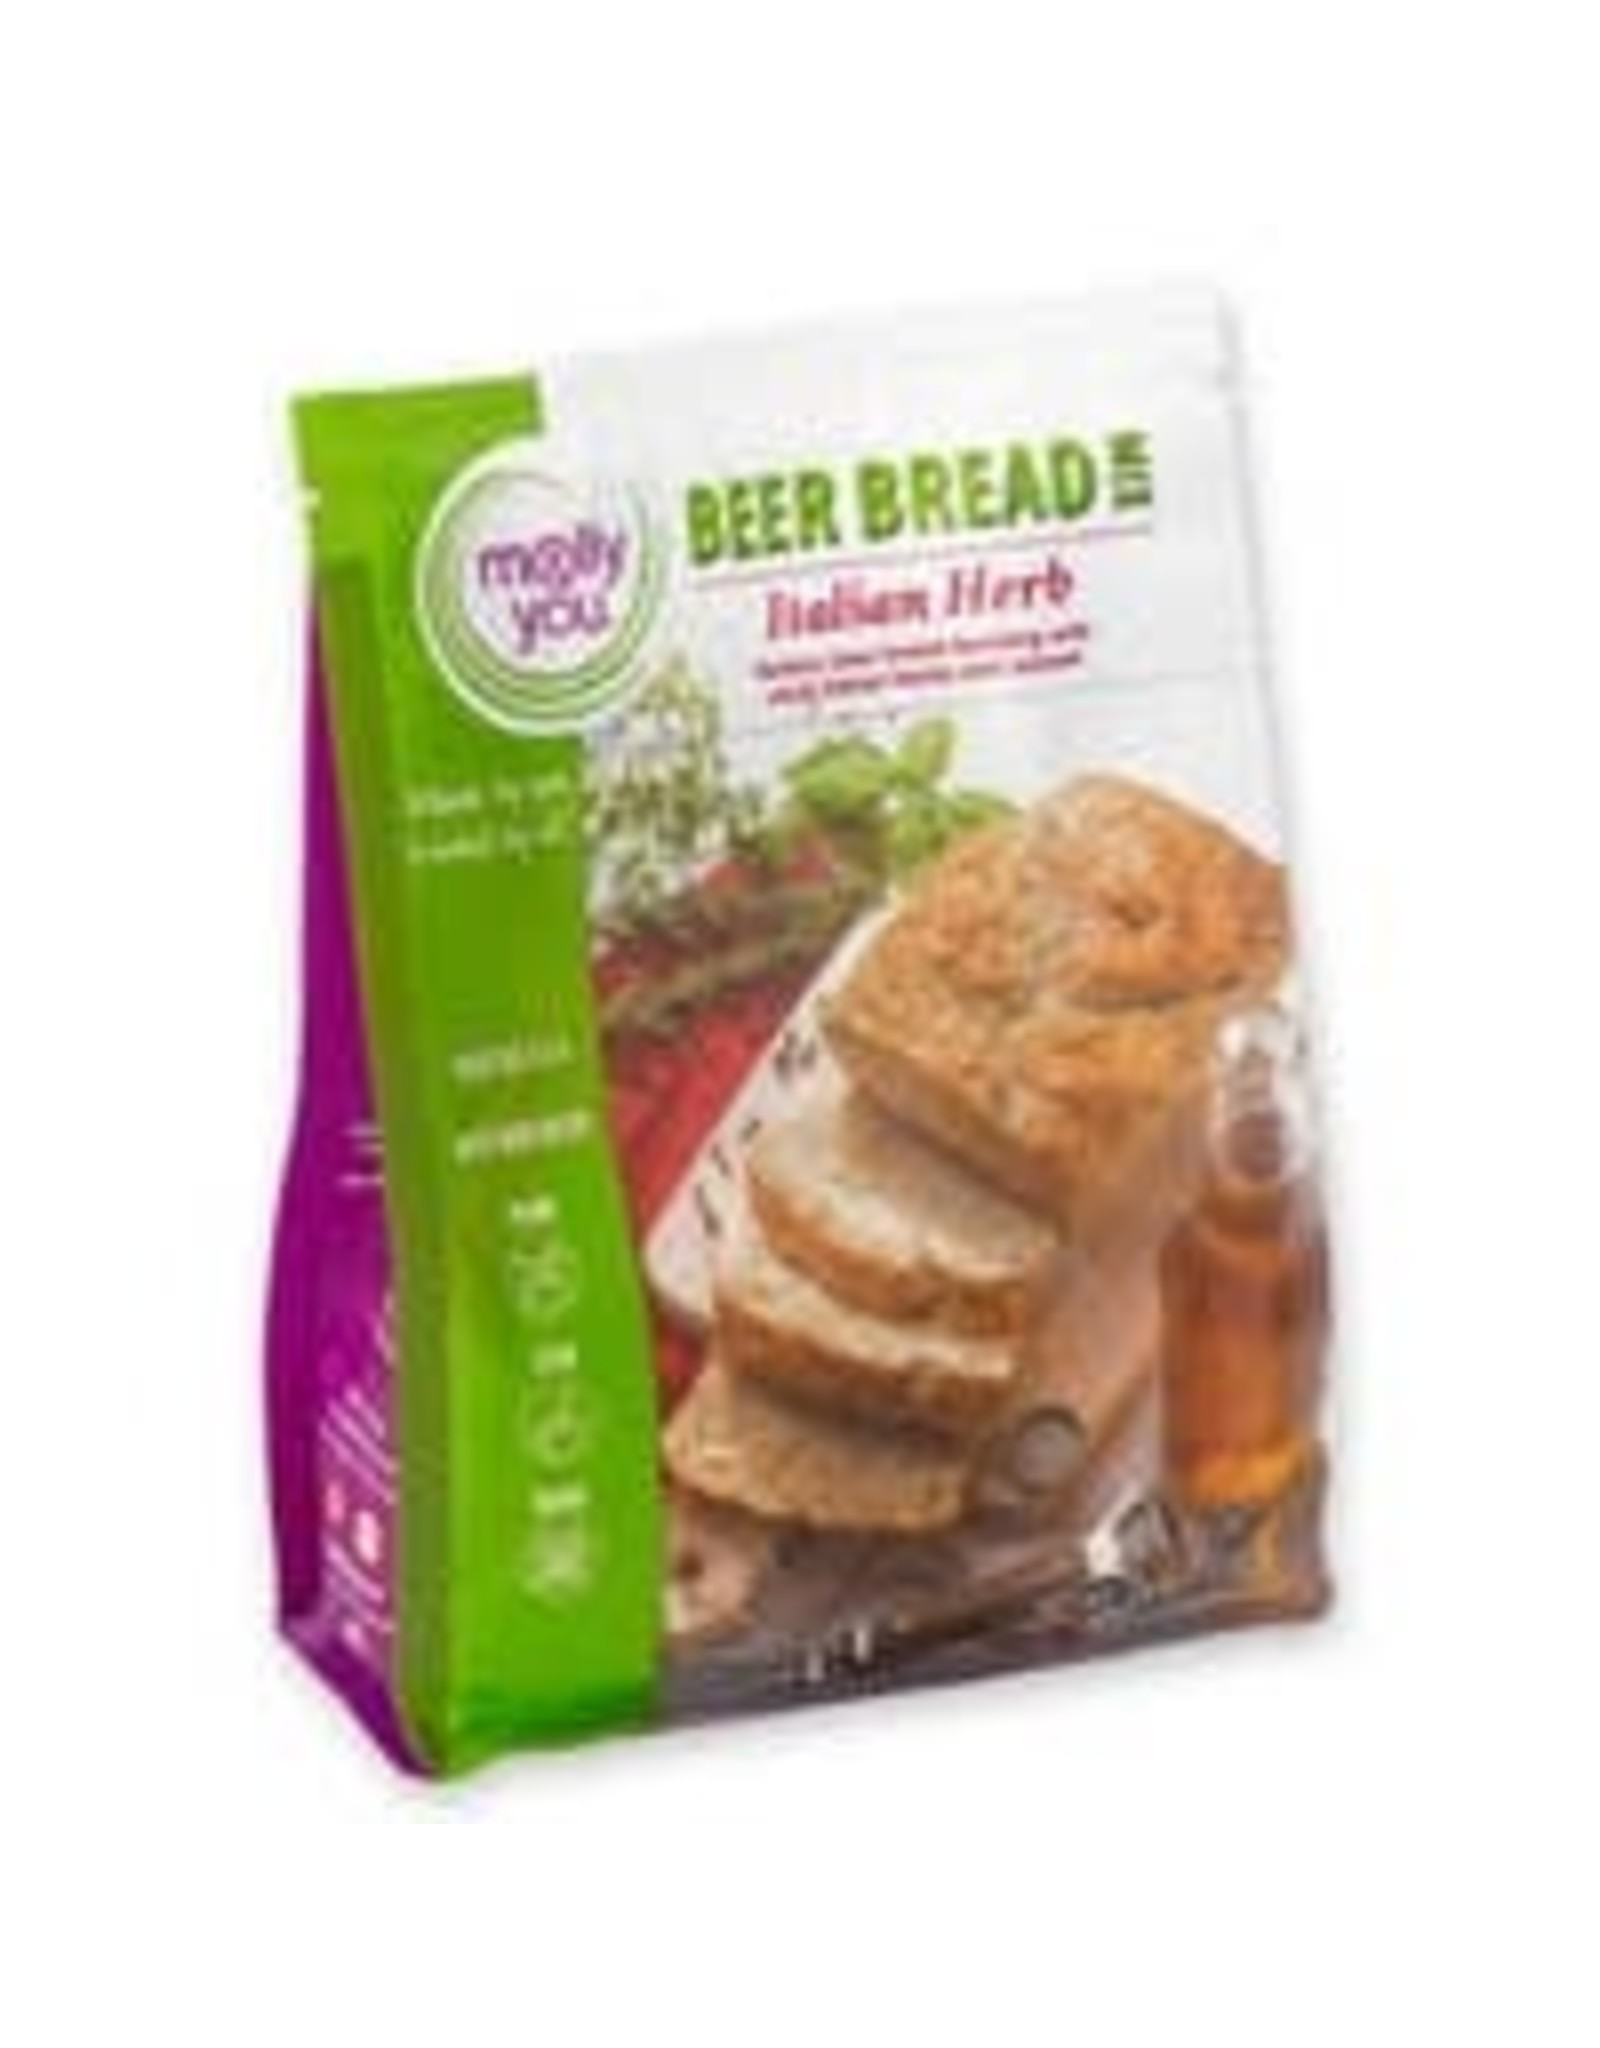 Beer Bread Mix, Italian Herb